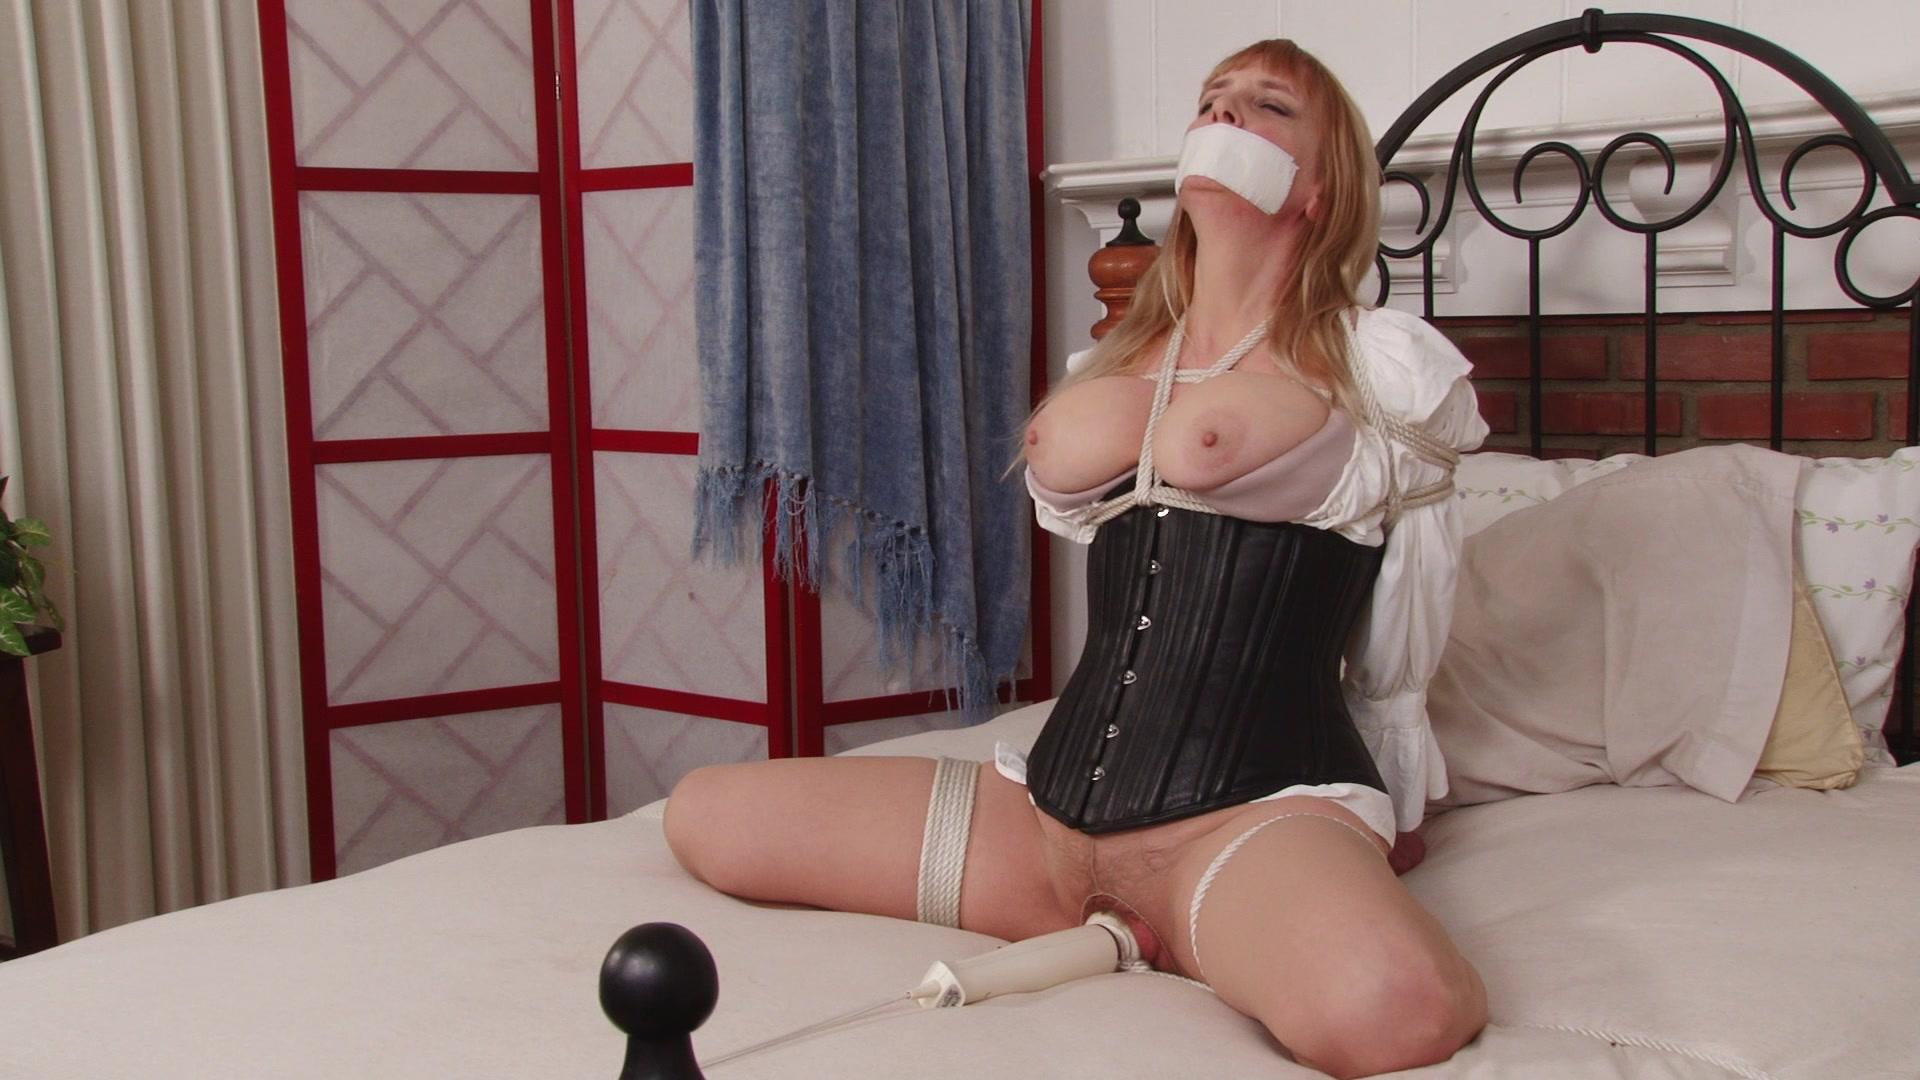 Lorelei Bedroom Bondage Ball Gag